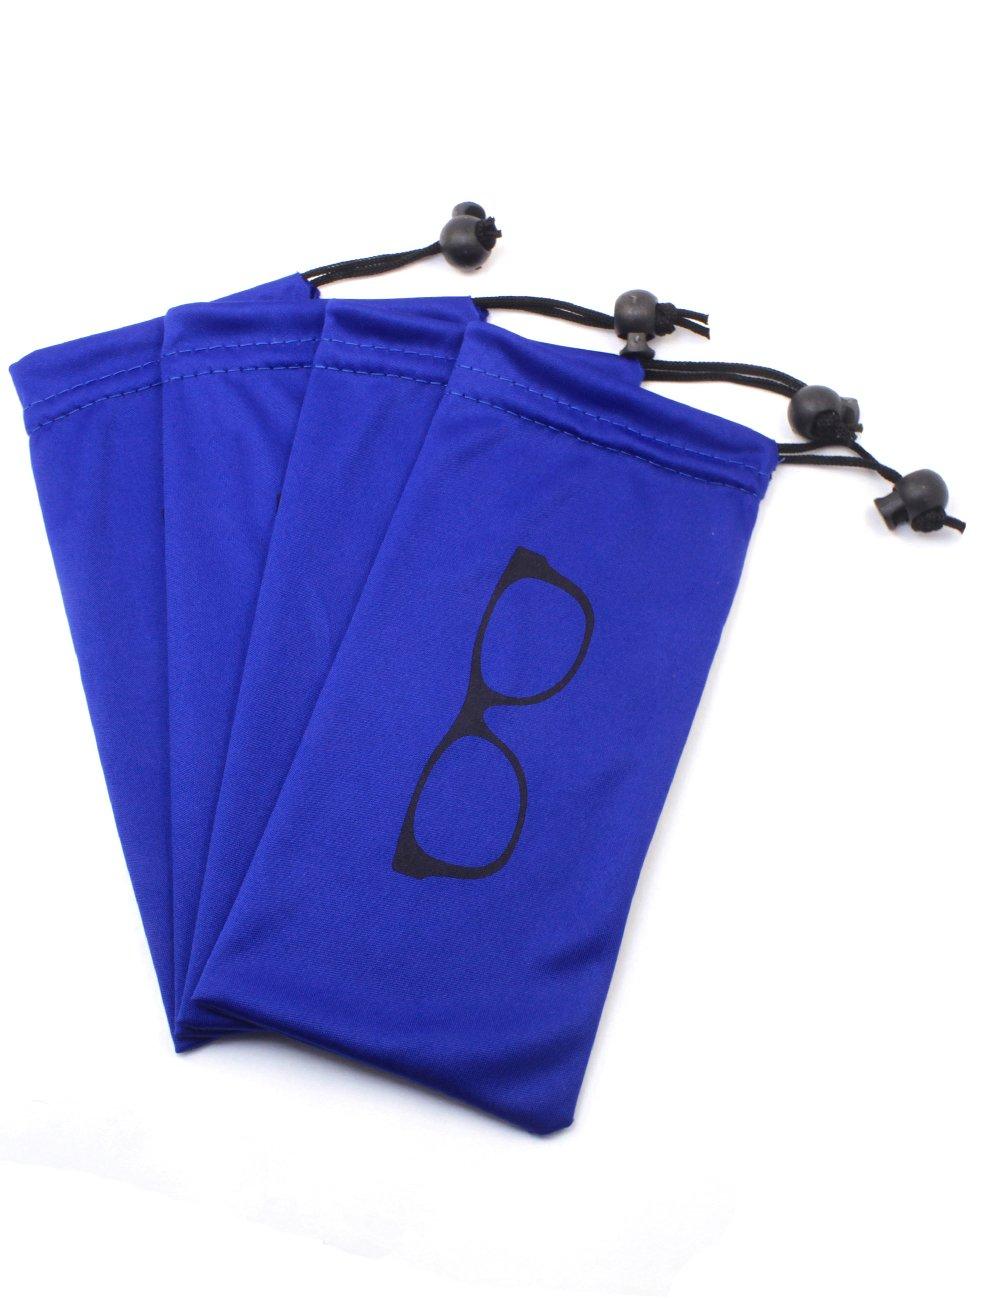 (4 PCS) Drawstring Microfiber Soft Eyeglasses Pouch With Bead Lock (Blue) Global Glasses Studio bag001